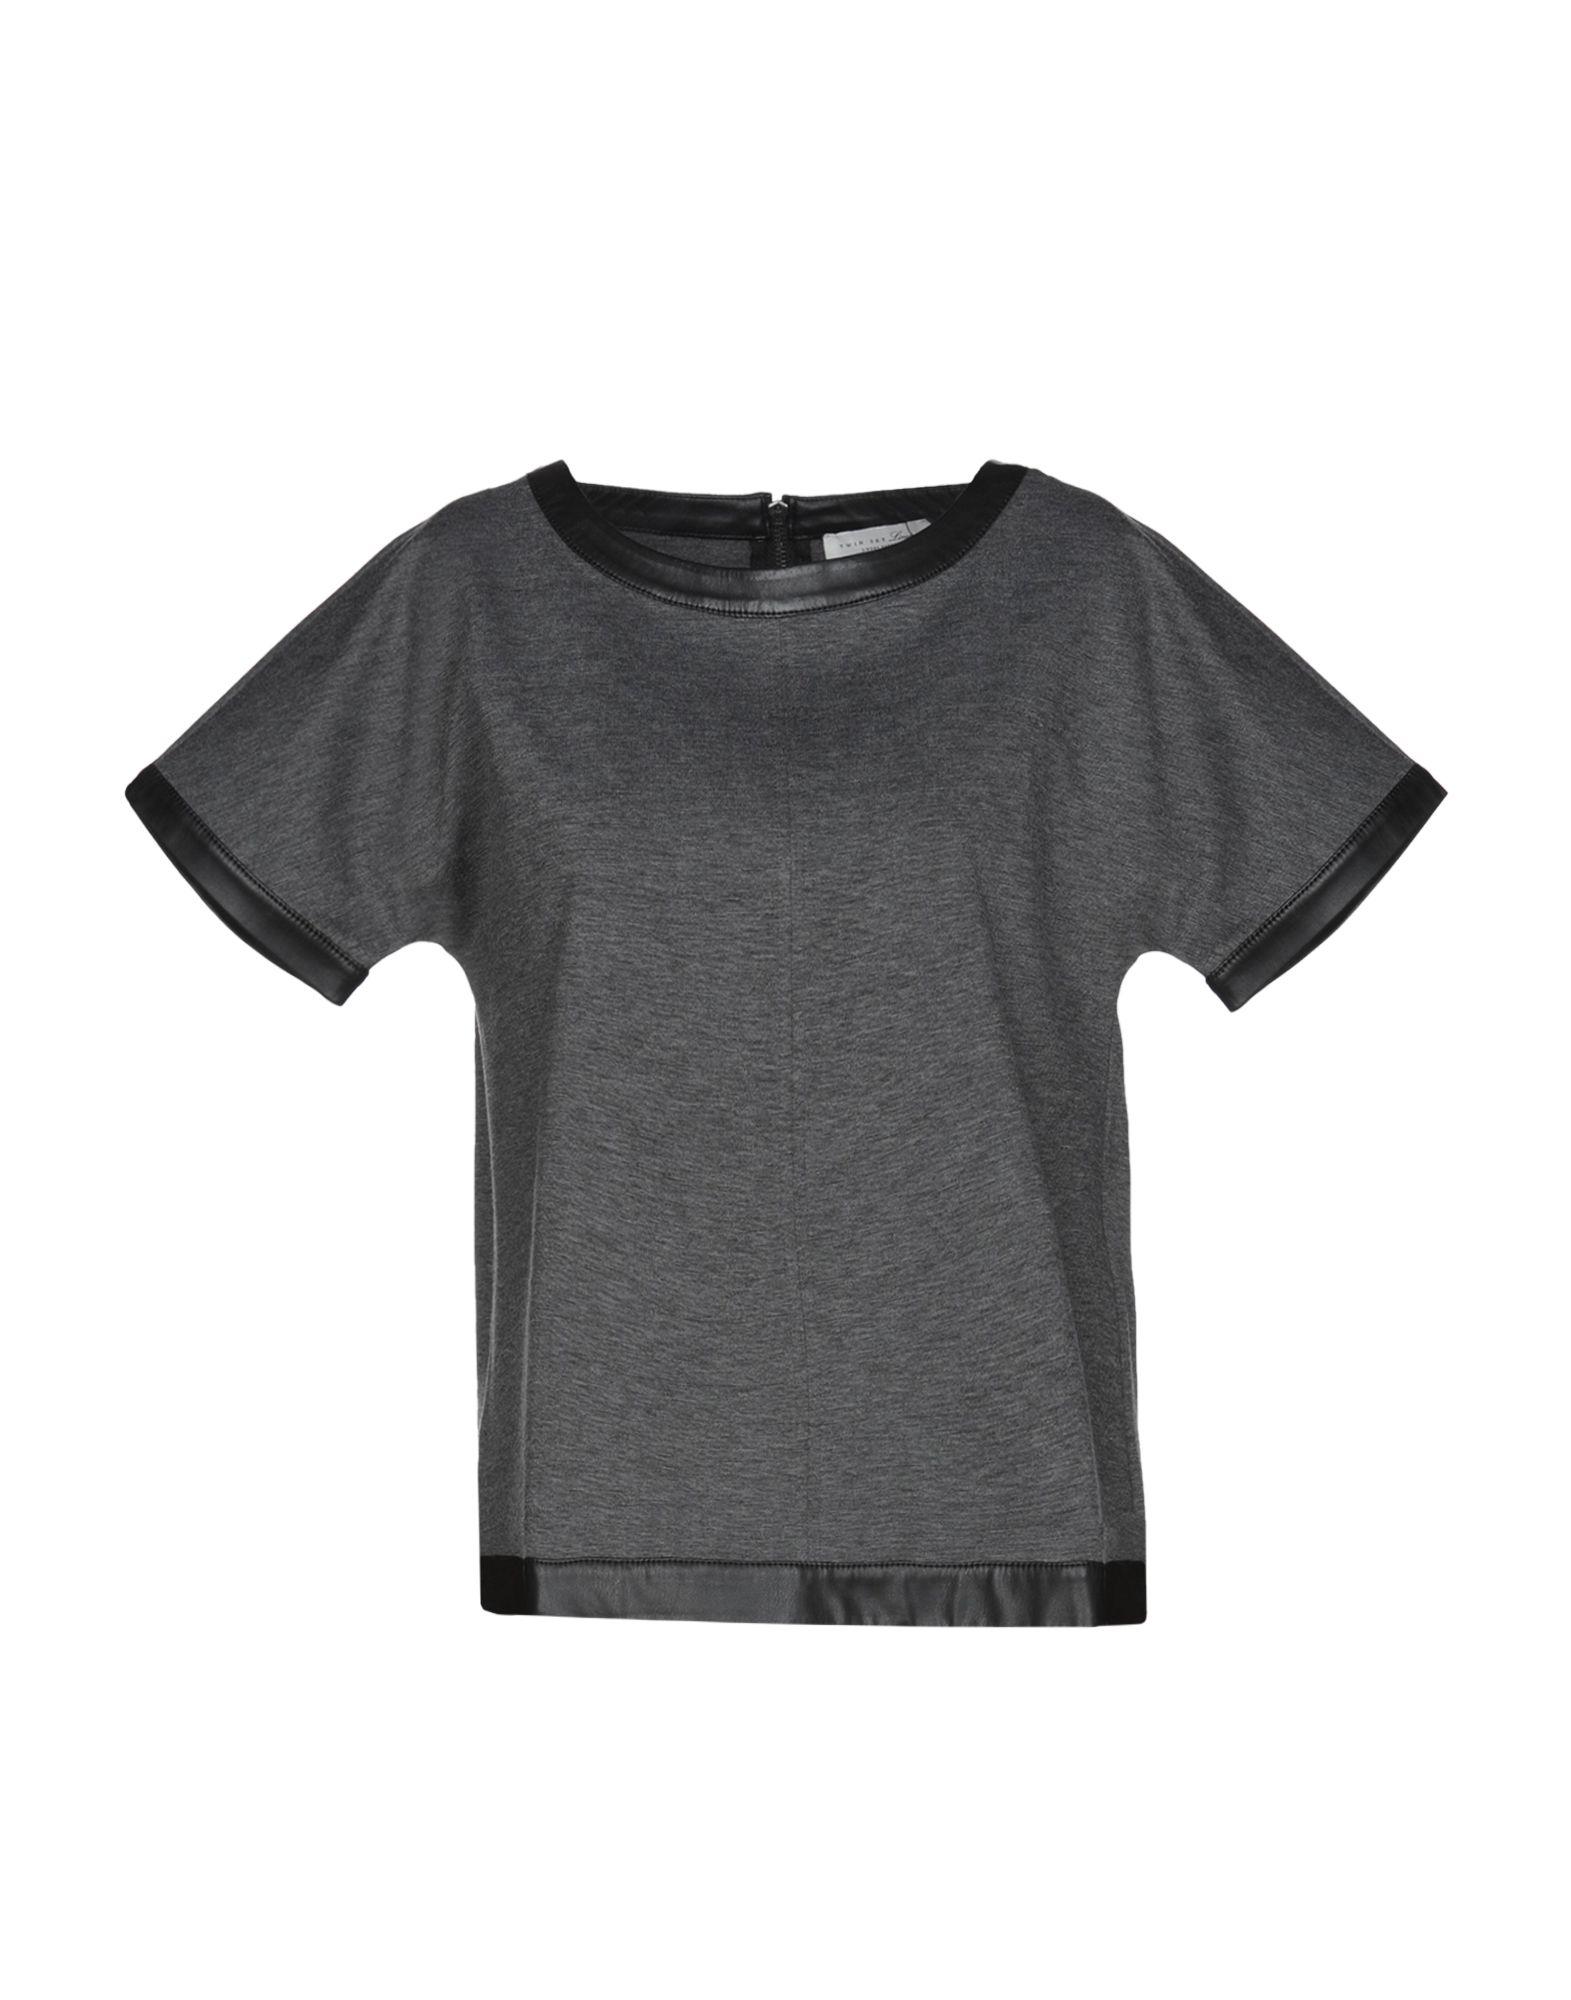 TWIN-SET LINGERIE Футболка sexy black lace lingerie set with no falsies